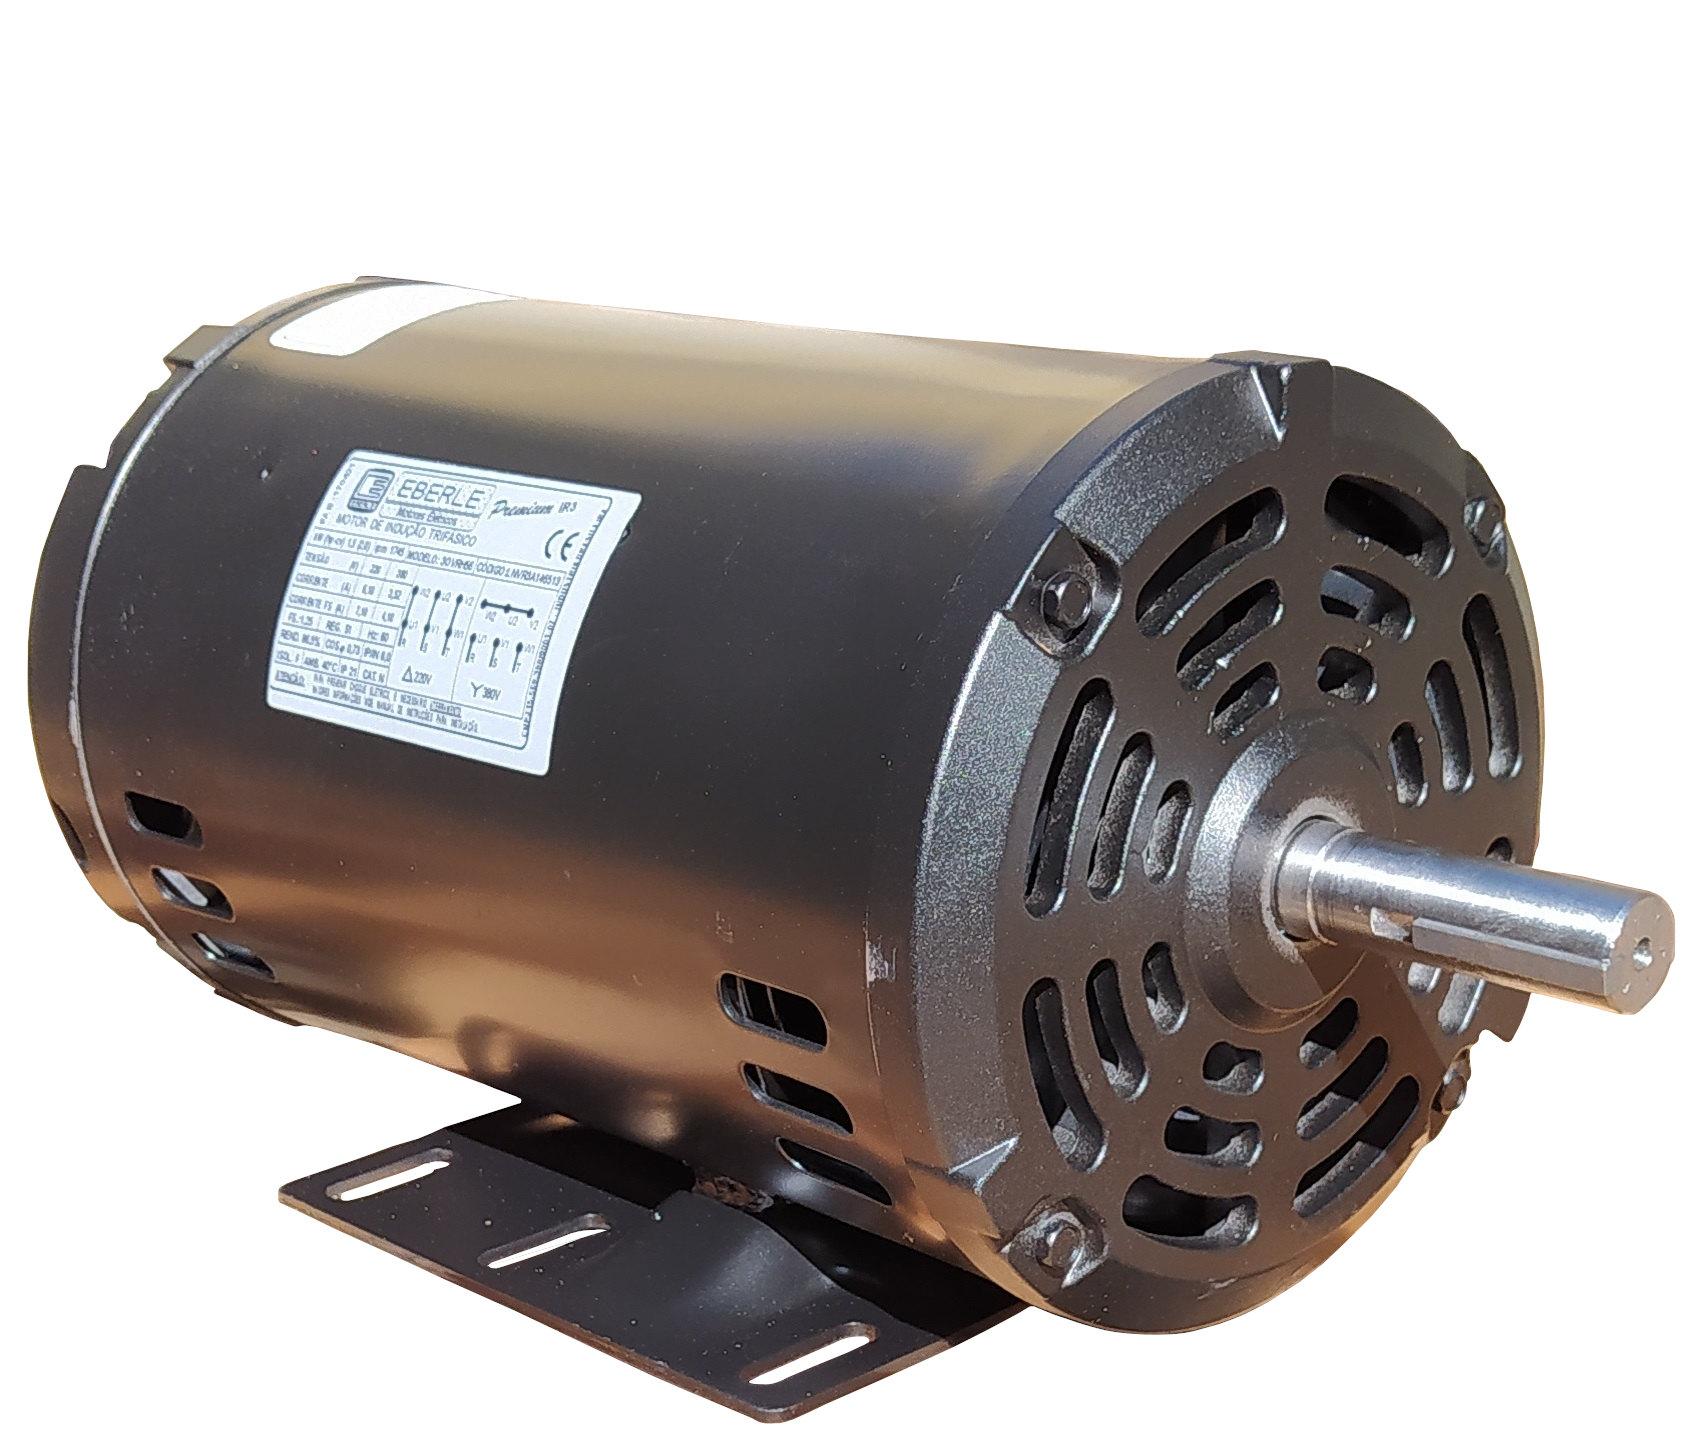 Motor Elétrico Trifásico 1cv 4 Polos Baixa Rotação 220/380v Aberto IP21 Eberle Mercosul IR3